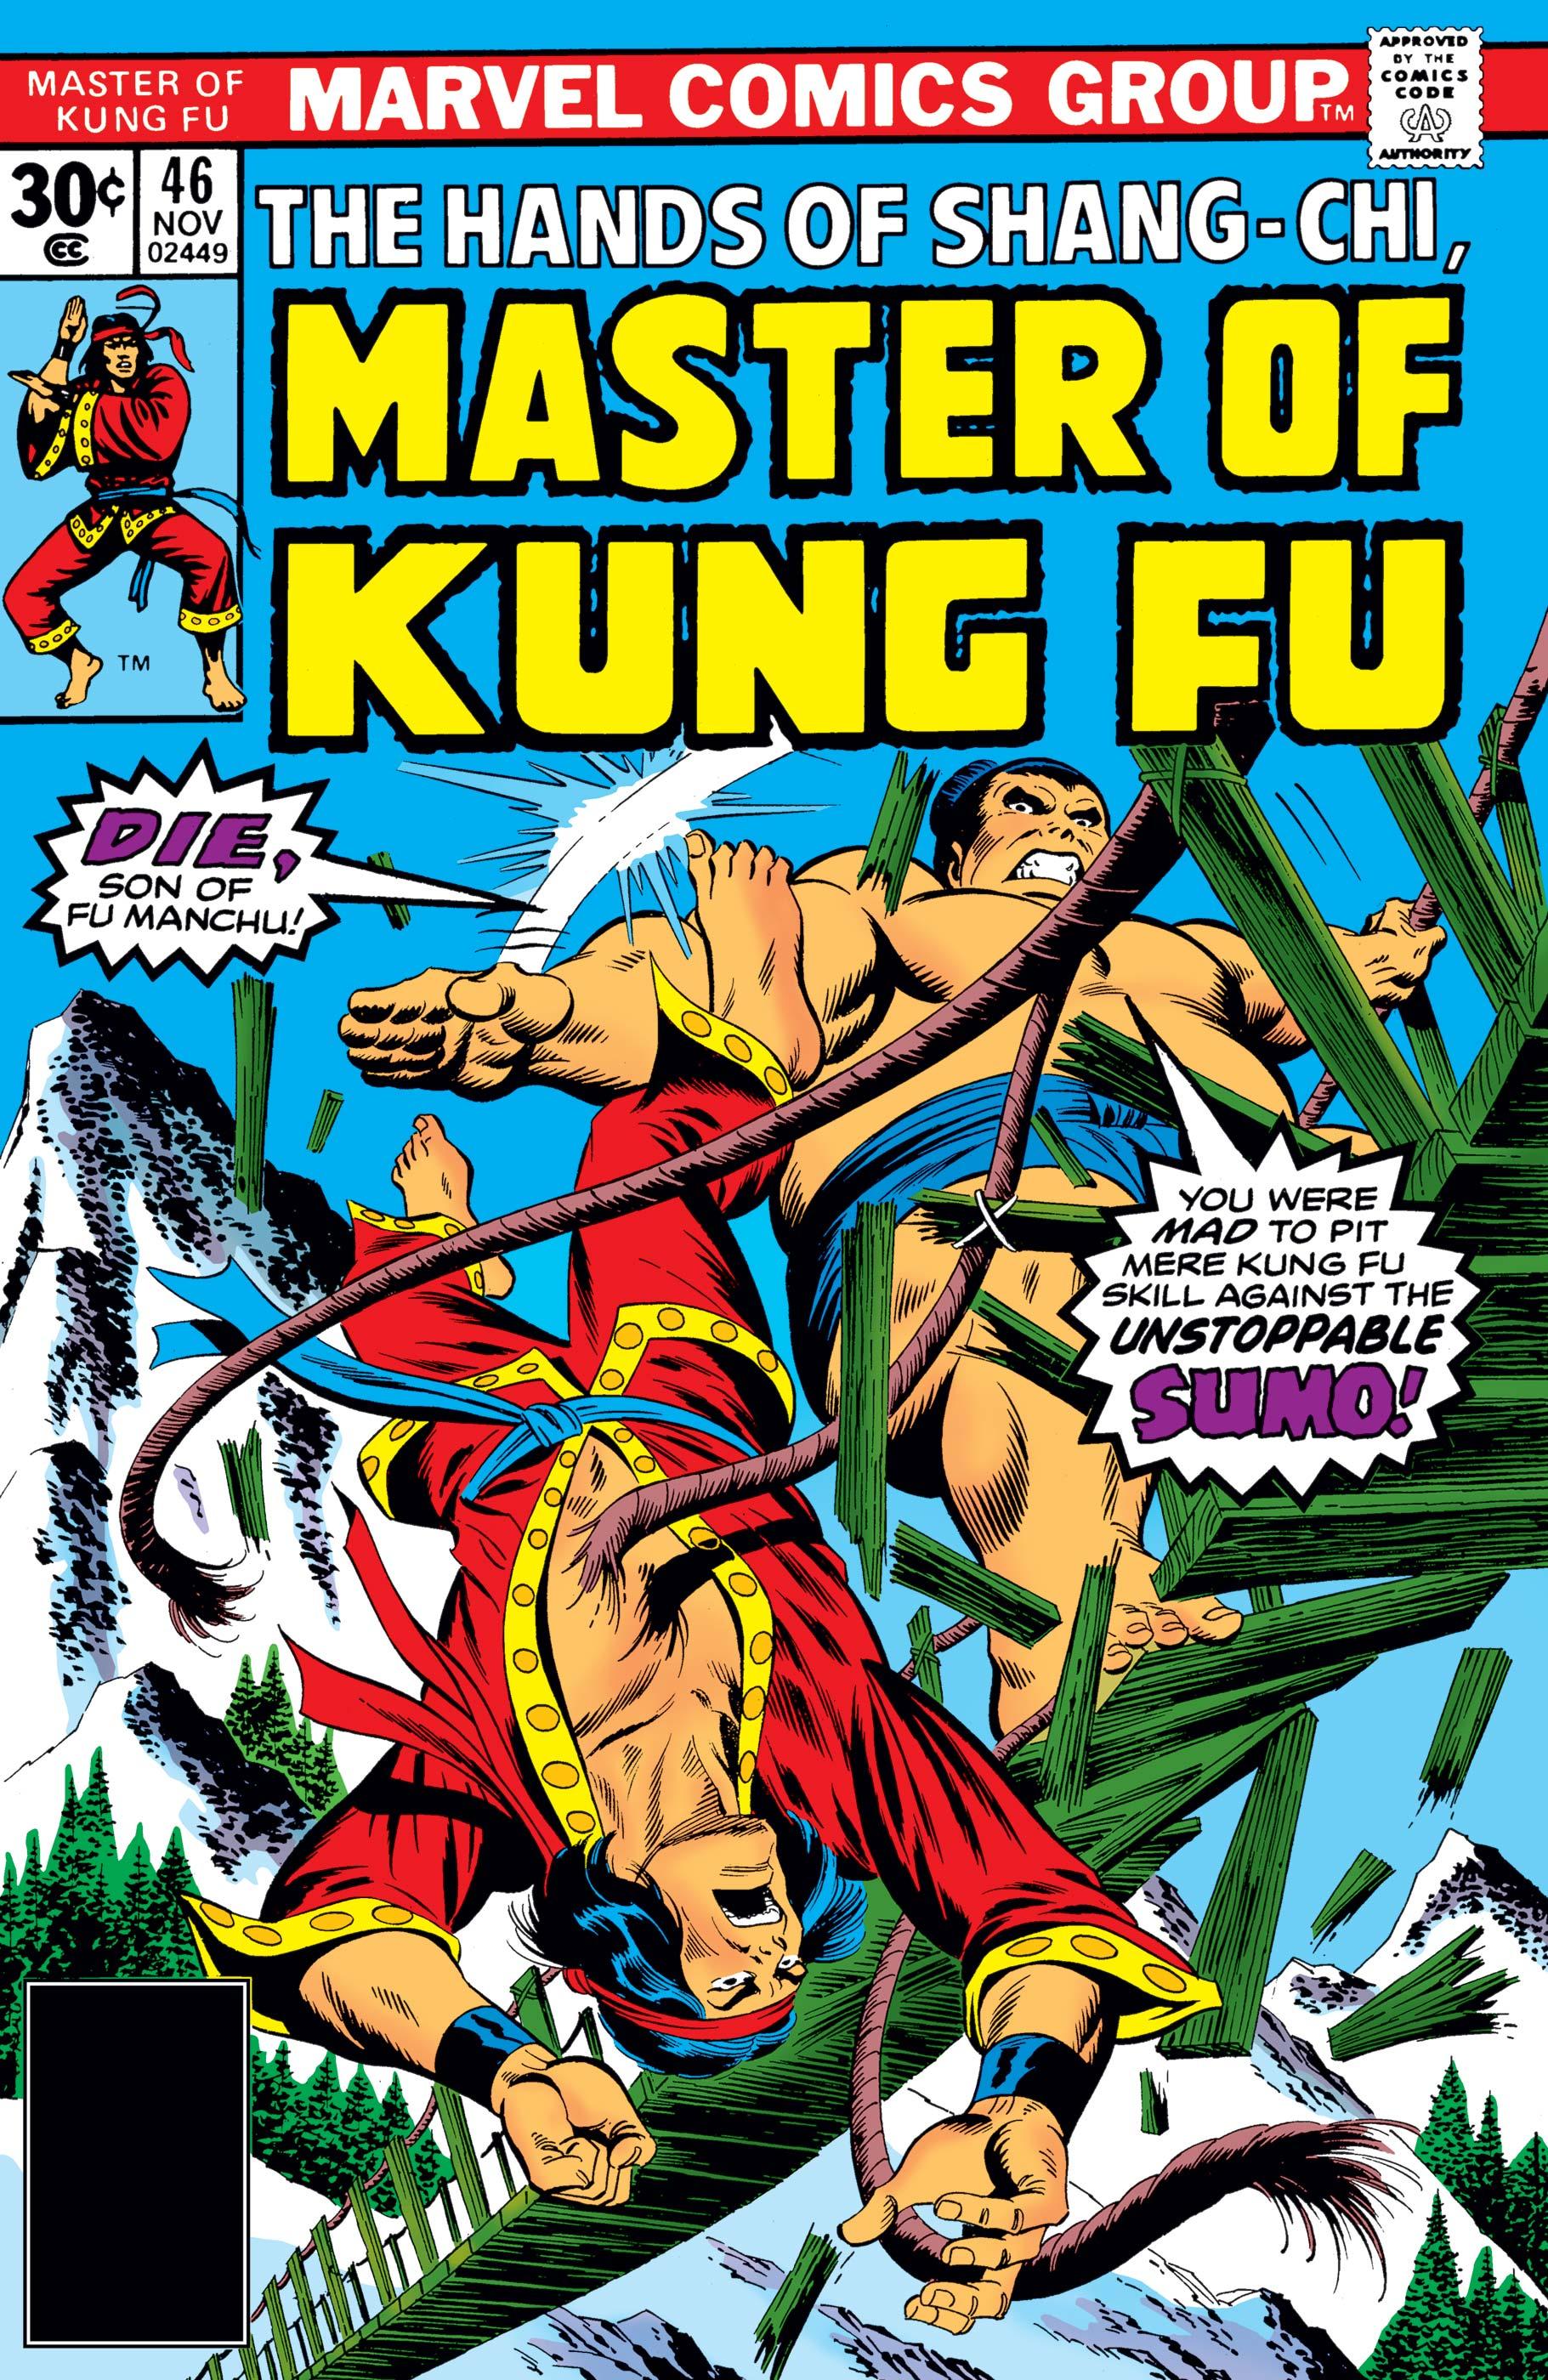 Master of Kung Fu (1974) #46